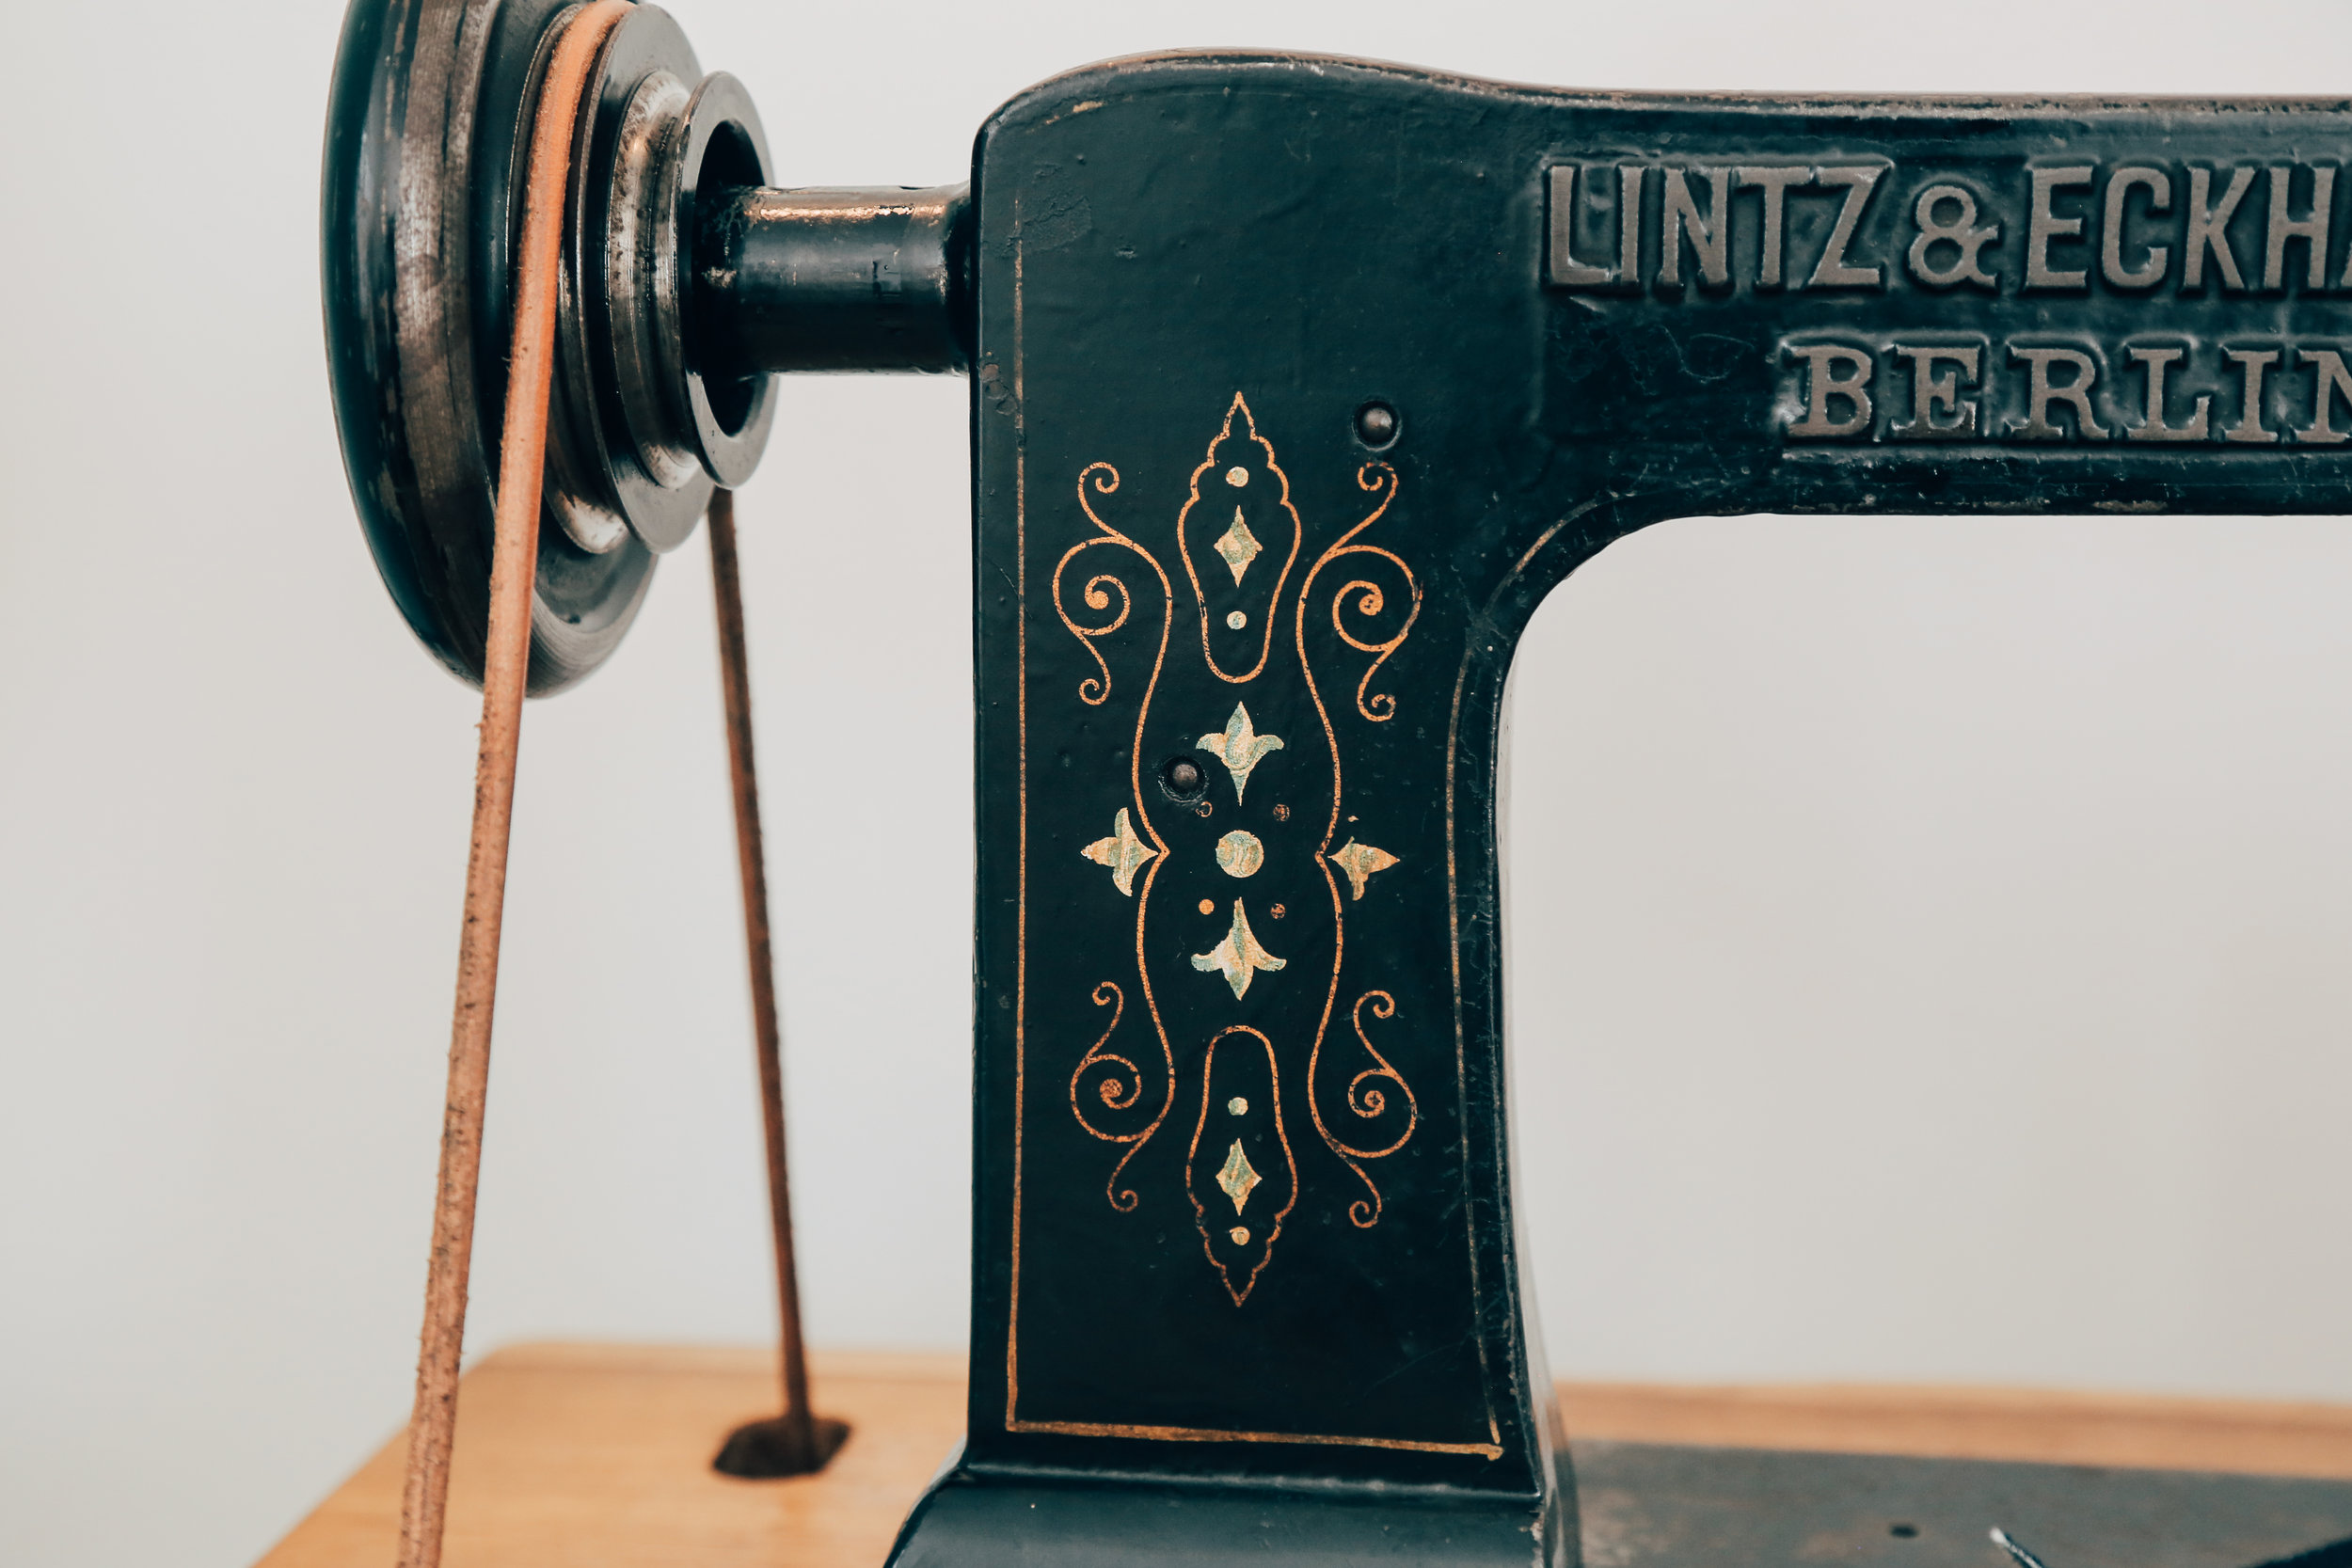 Lintz & Eckhardt 11 Cornely K vintage chainstitch embroidery machine 10